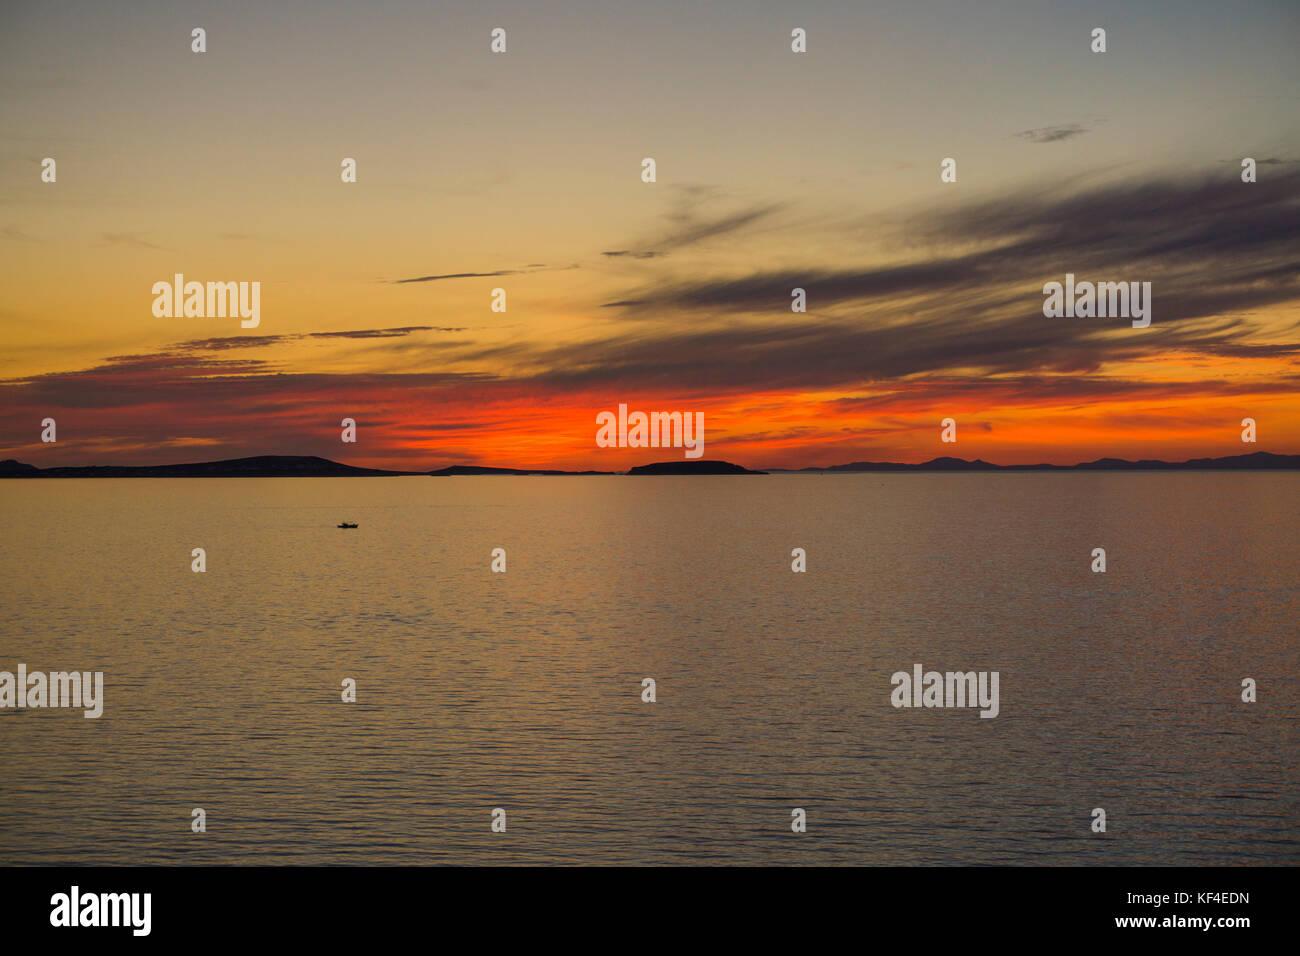 Sonnenuntergang über dem Ägäischen Meer, Insel Naxos, Kykladen, Ägäis, Griechenland Stockbild